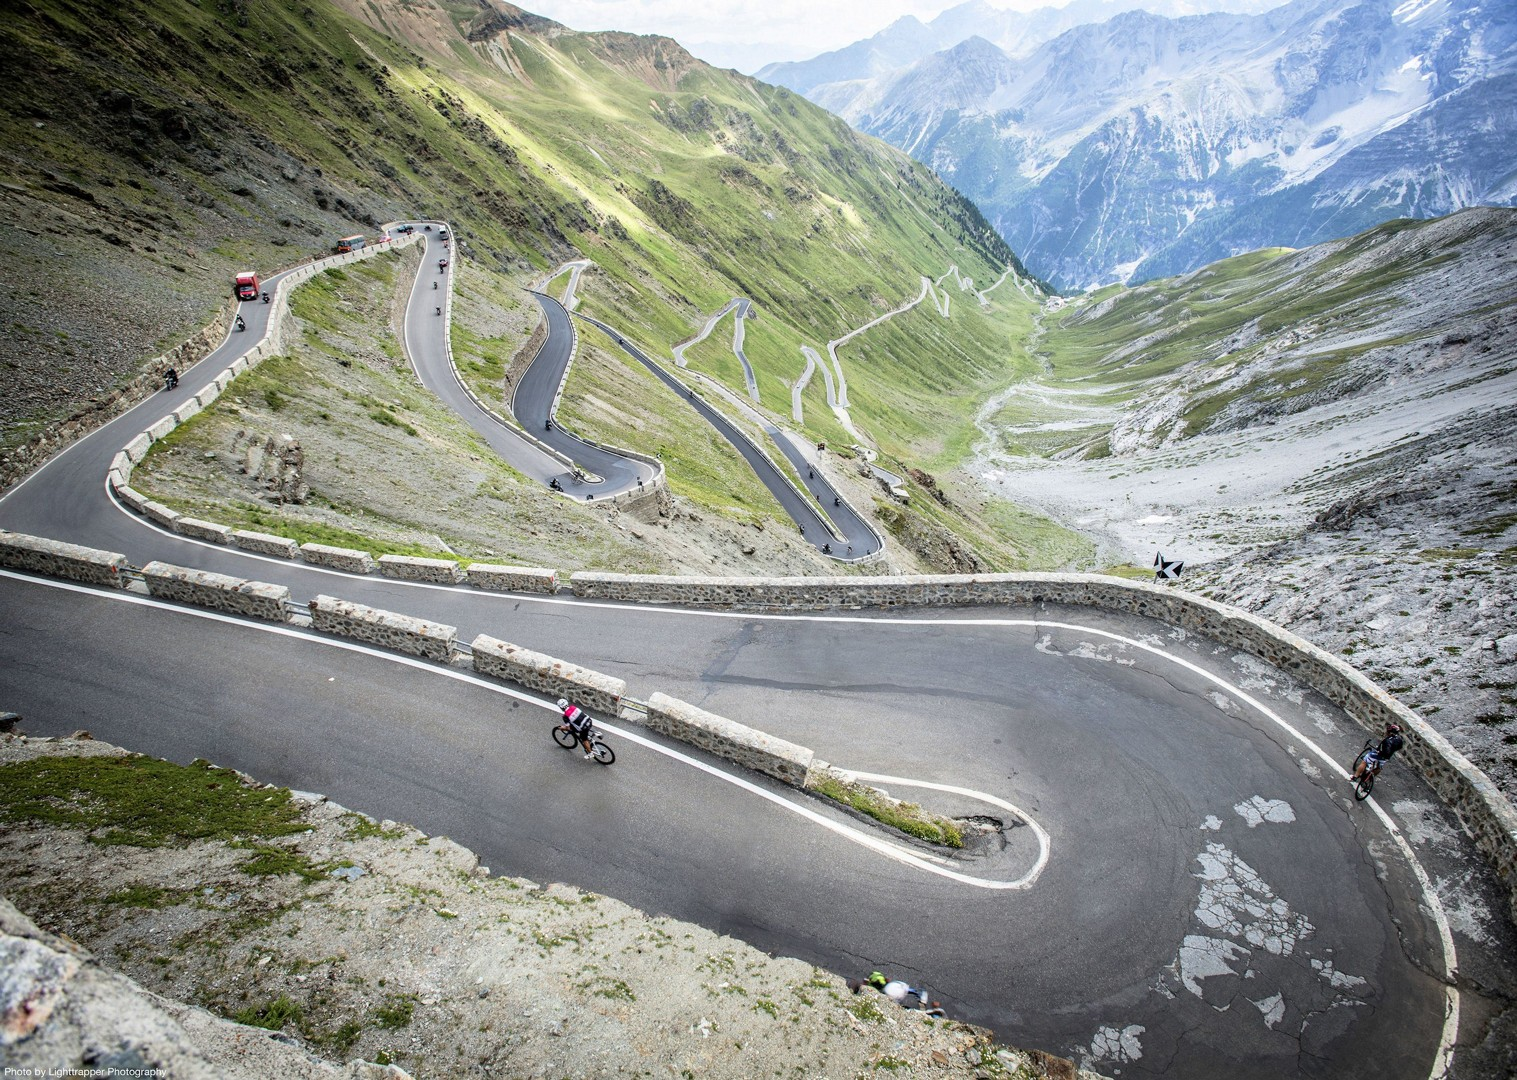 stelvio-guided-road-cycling-holiday.jpg - Italy - Italian Alps Introduction - Guided Road Cycling Holiday - Italia Road Cycling